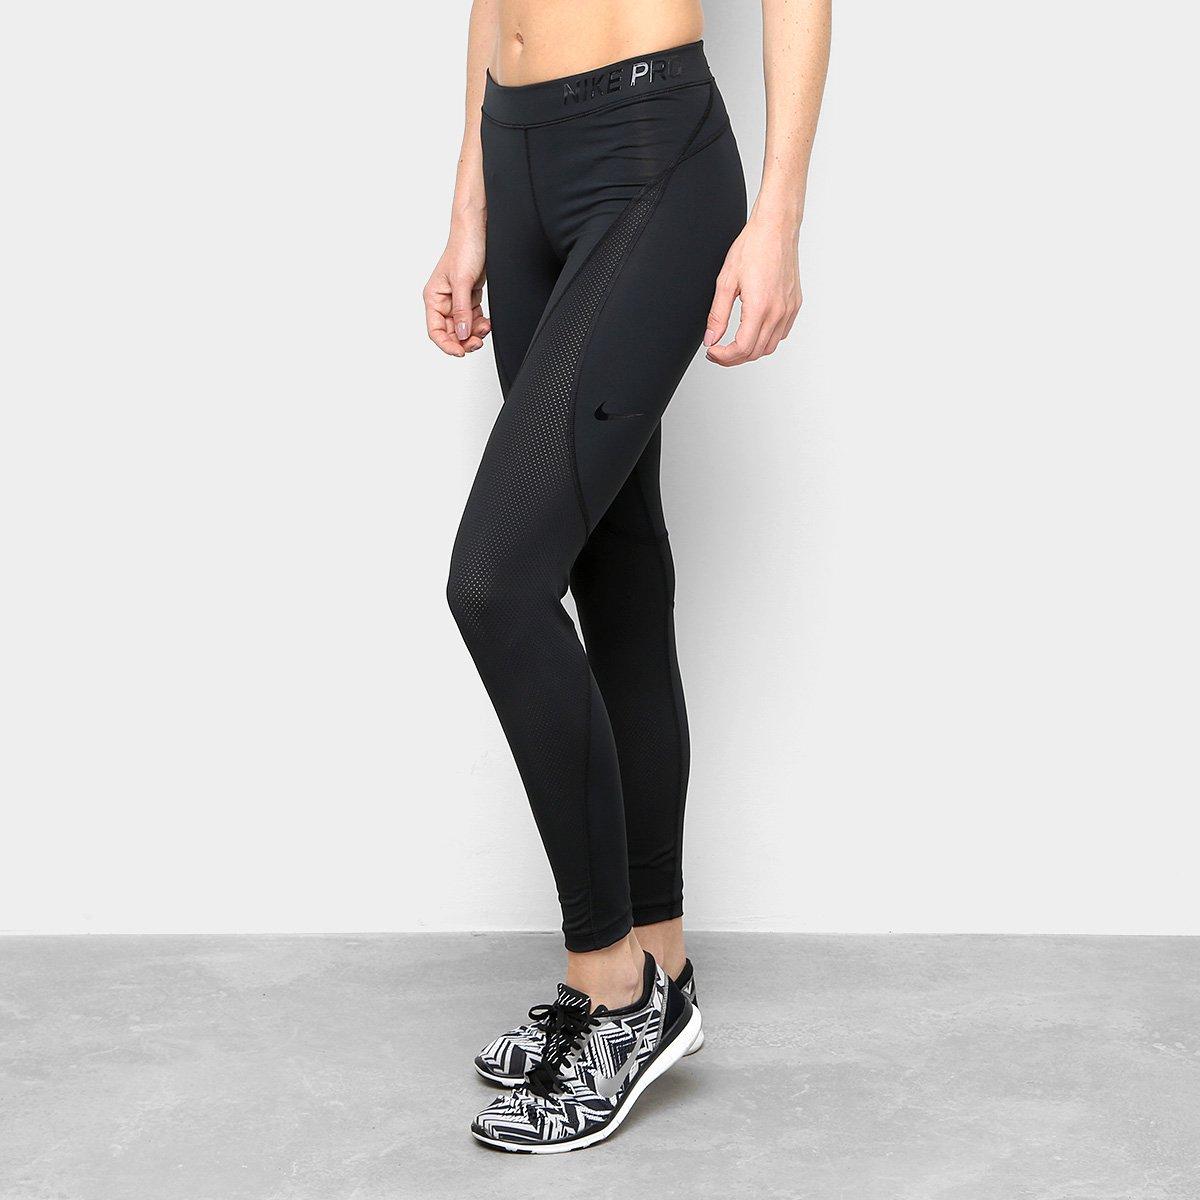 c803ceb3f0f57 Calça Legging Nike Pro Hypercool Feminina - Compre Agora